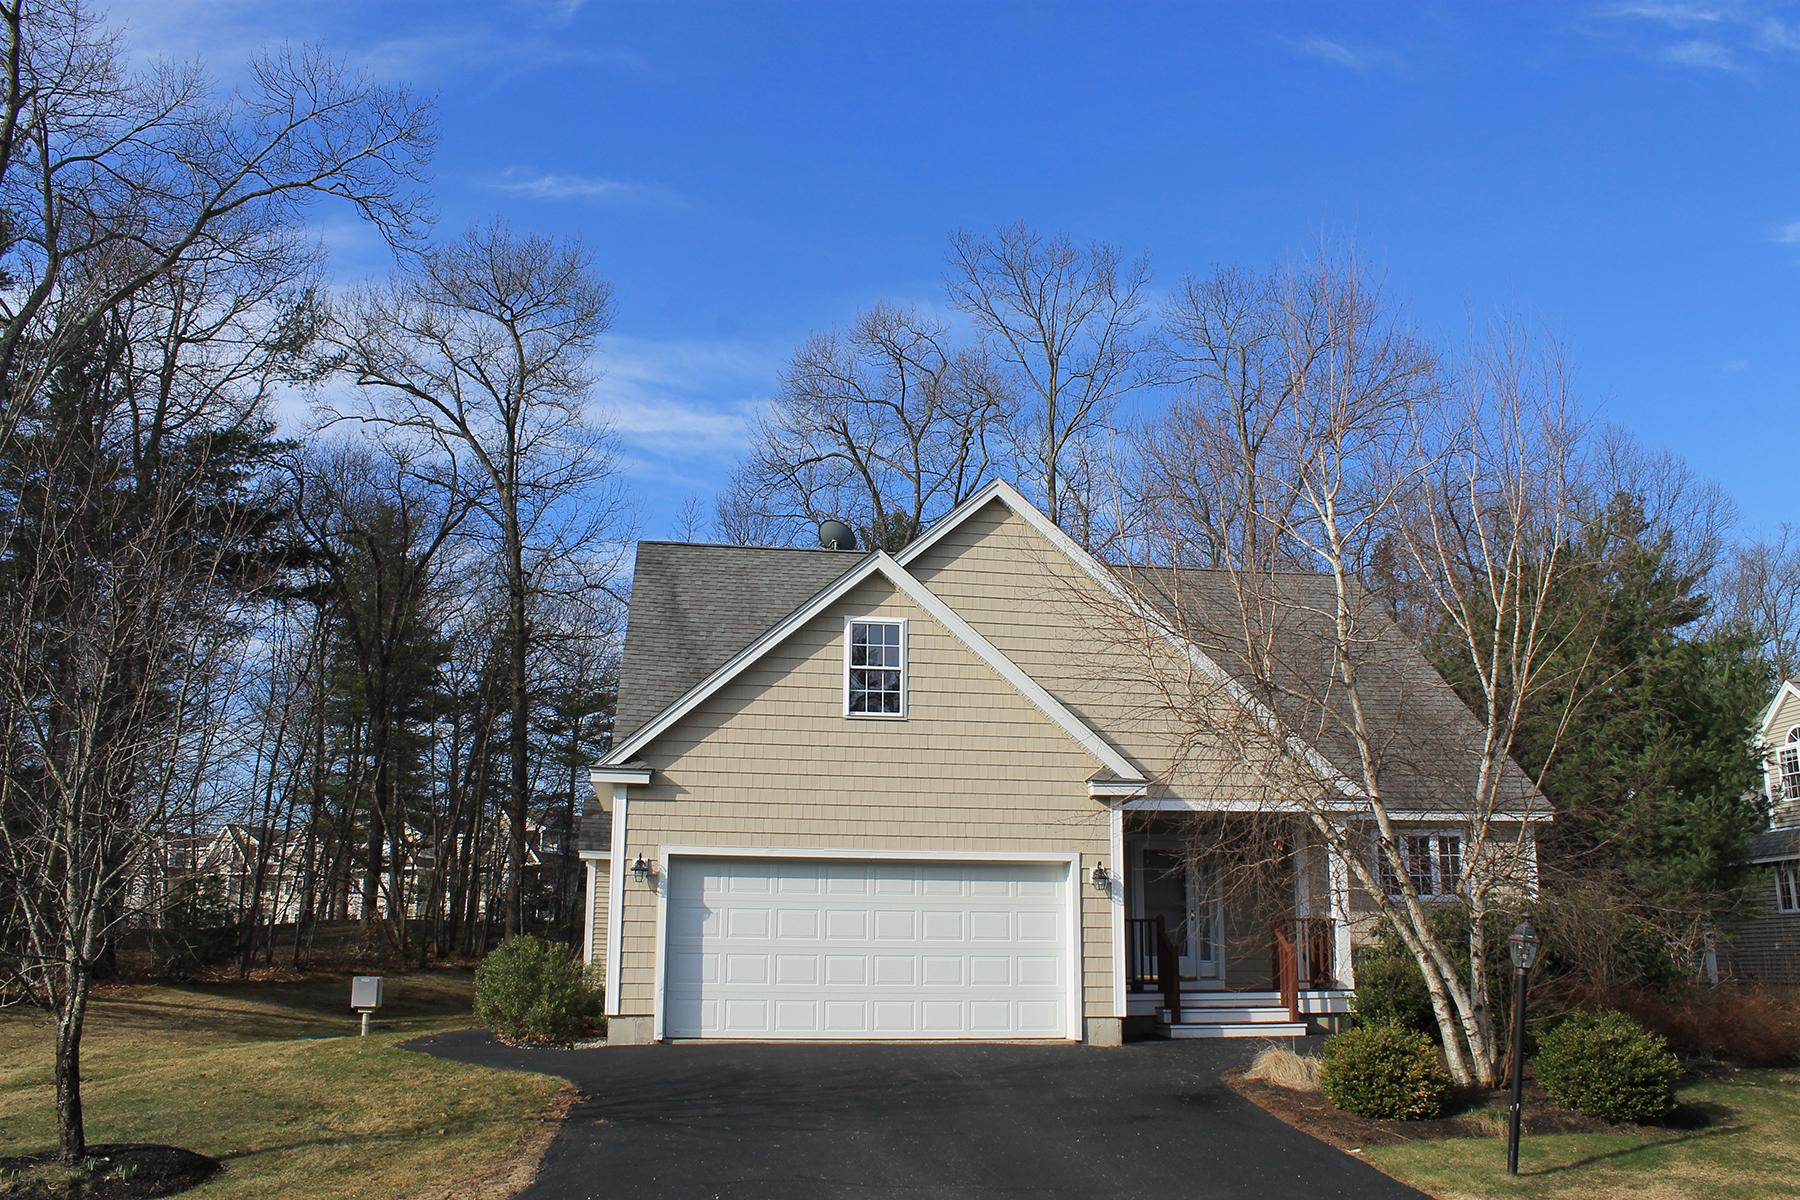 Condominium for Sale at 45 Vineyard Drive, #51 Stratham, New Hampshire, 03885 United States